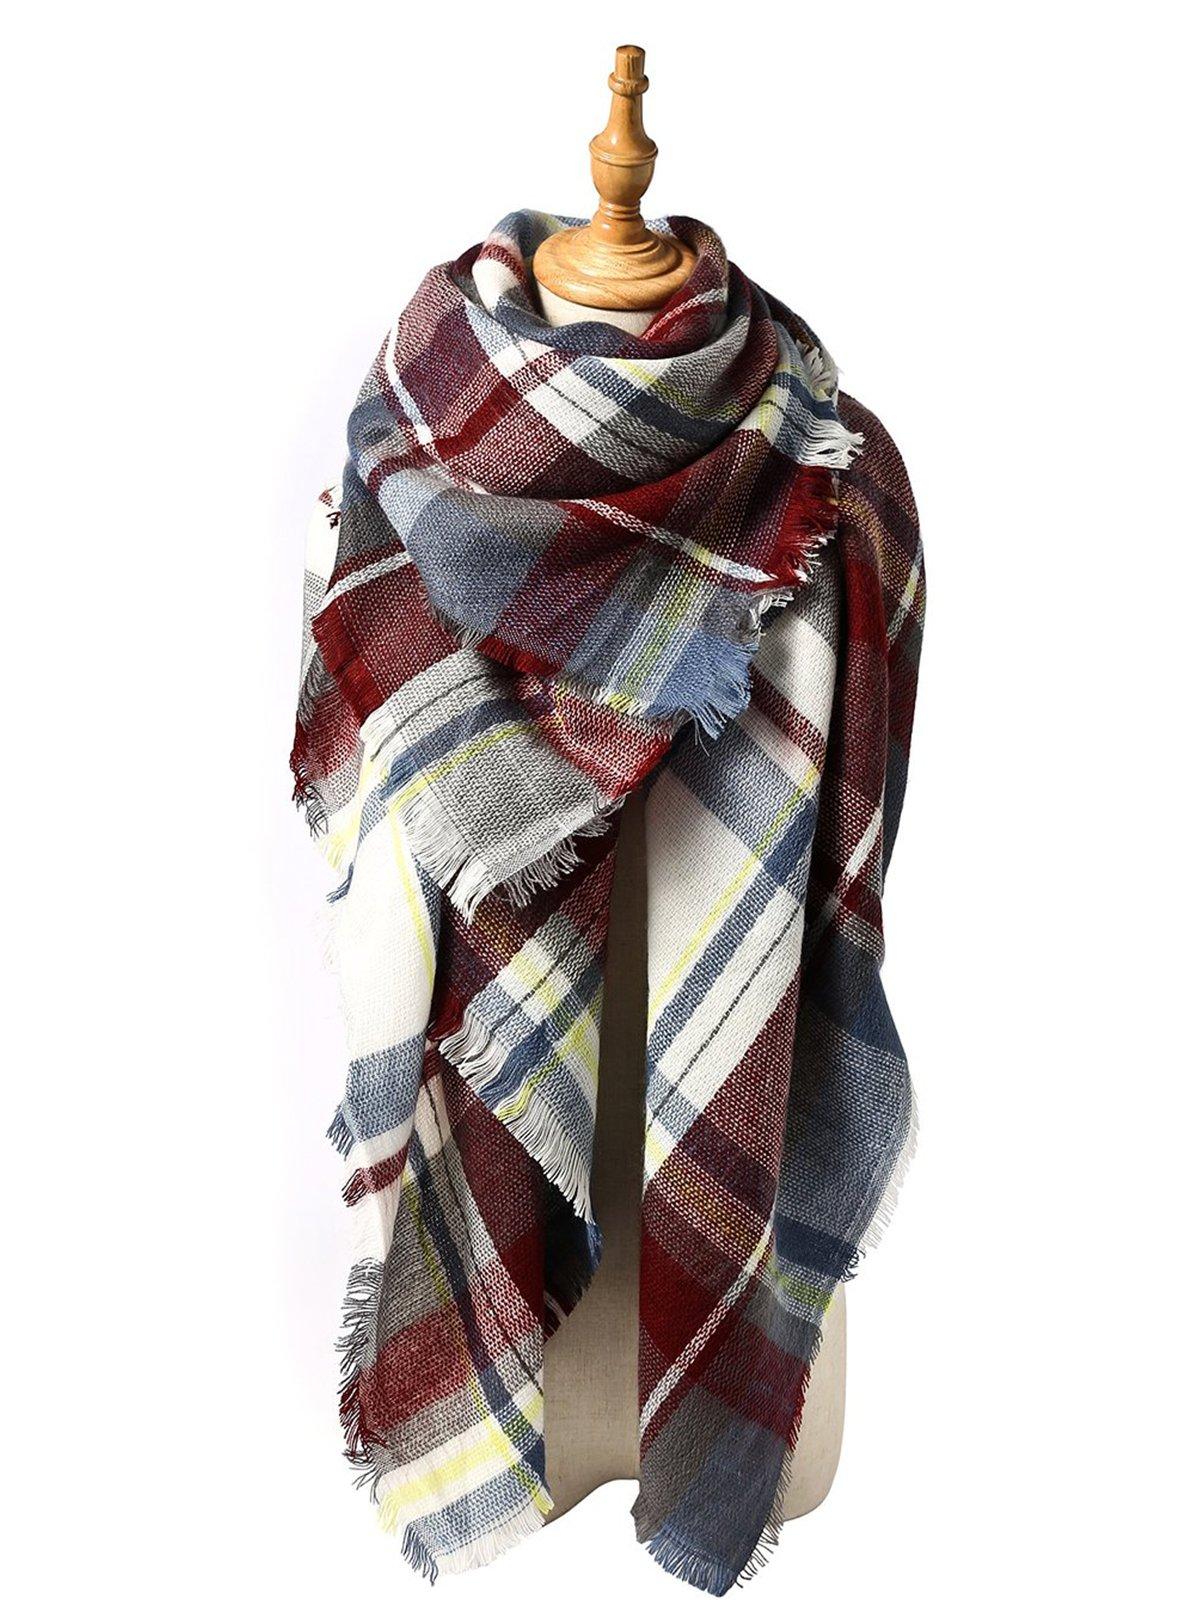 Zando Thick Plaid Blanket Scarf Big Fall Scarves Shawl Soft Warm Wrap Scarf Tartan Cape Cozy Winter Scarfs for Women Fuchsia Scarf